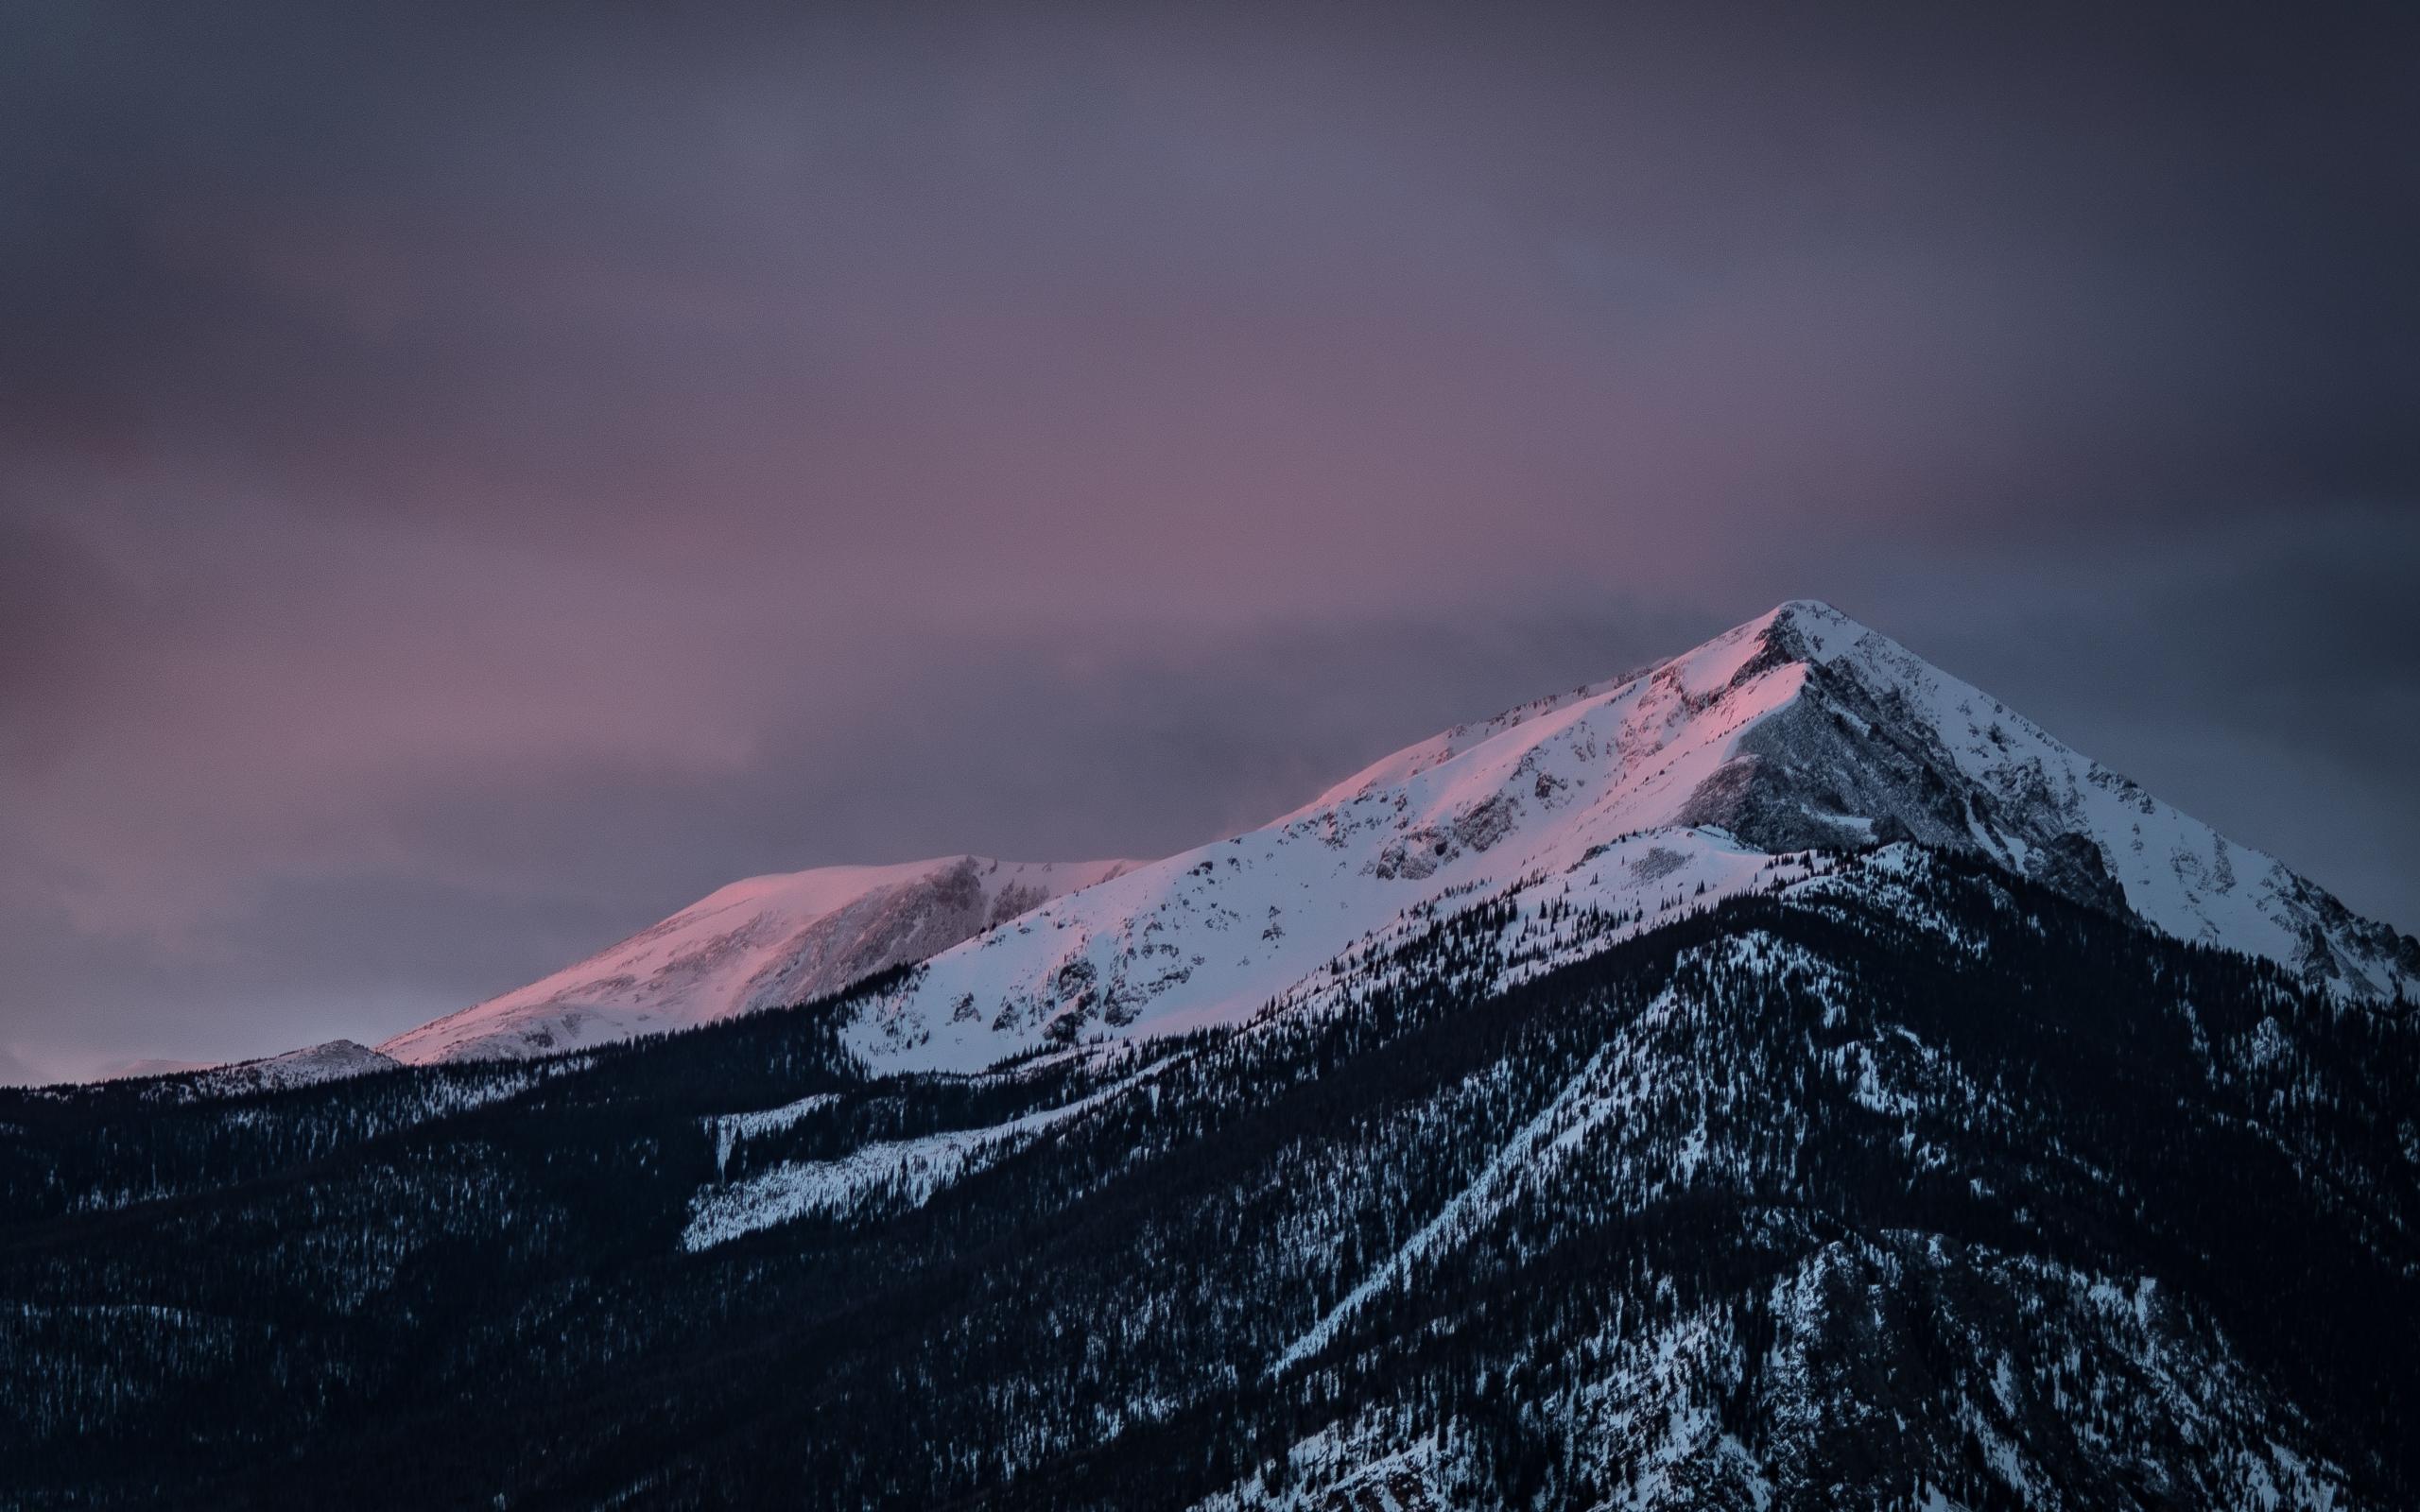 Desktop Wallpaper Snow Mountains Clean Sky Nature 4k Hd Image Picture Background 3d4192